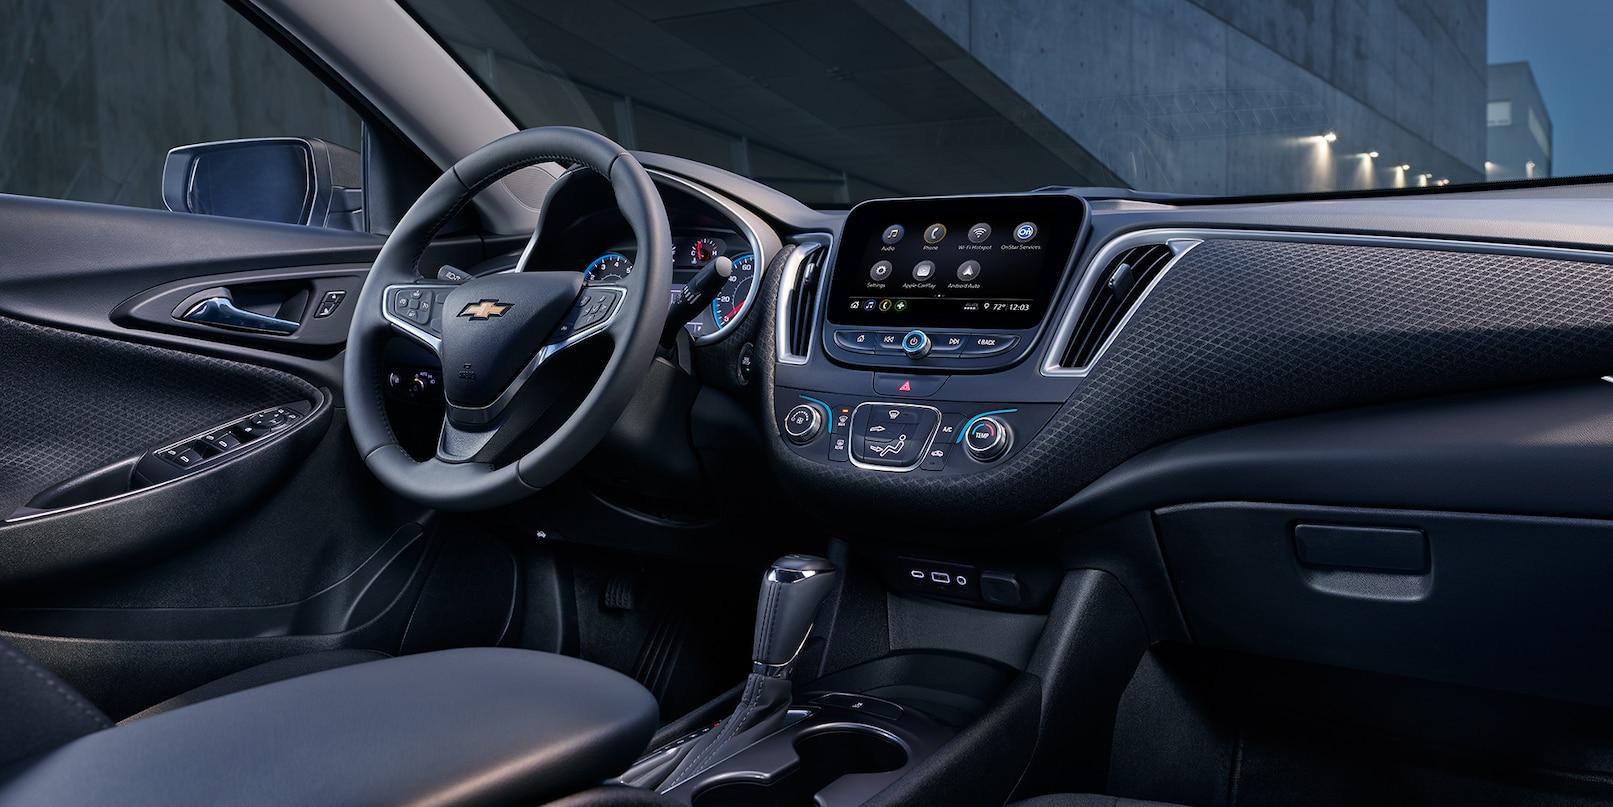 Interior of the 2019 Chevrolet Malibu